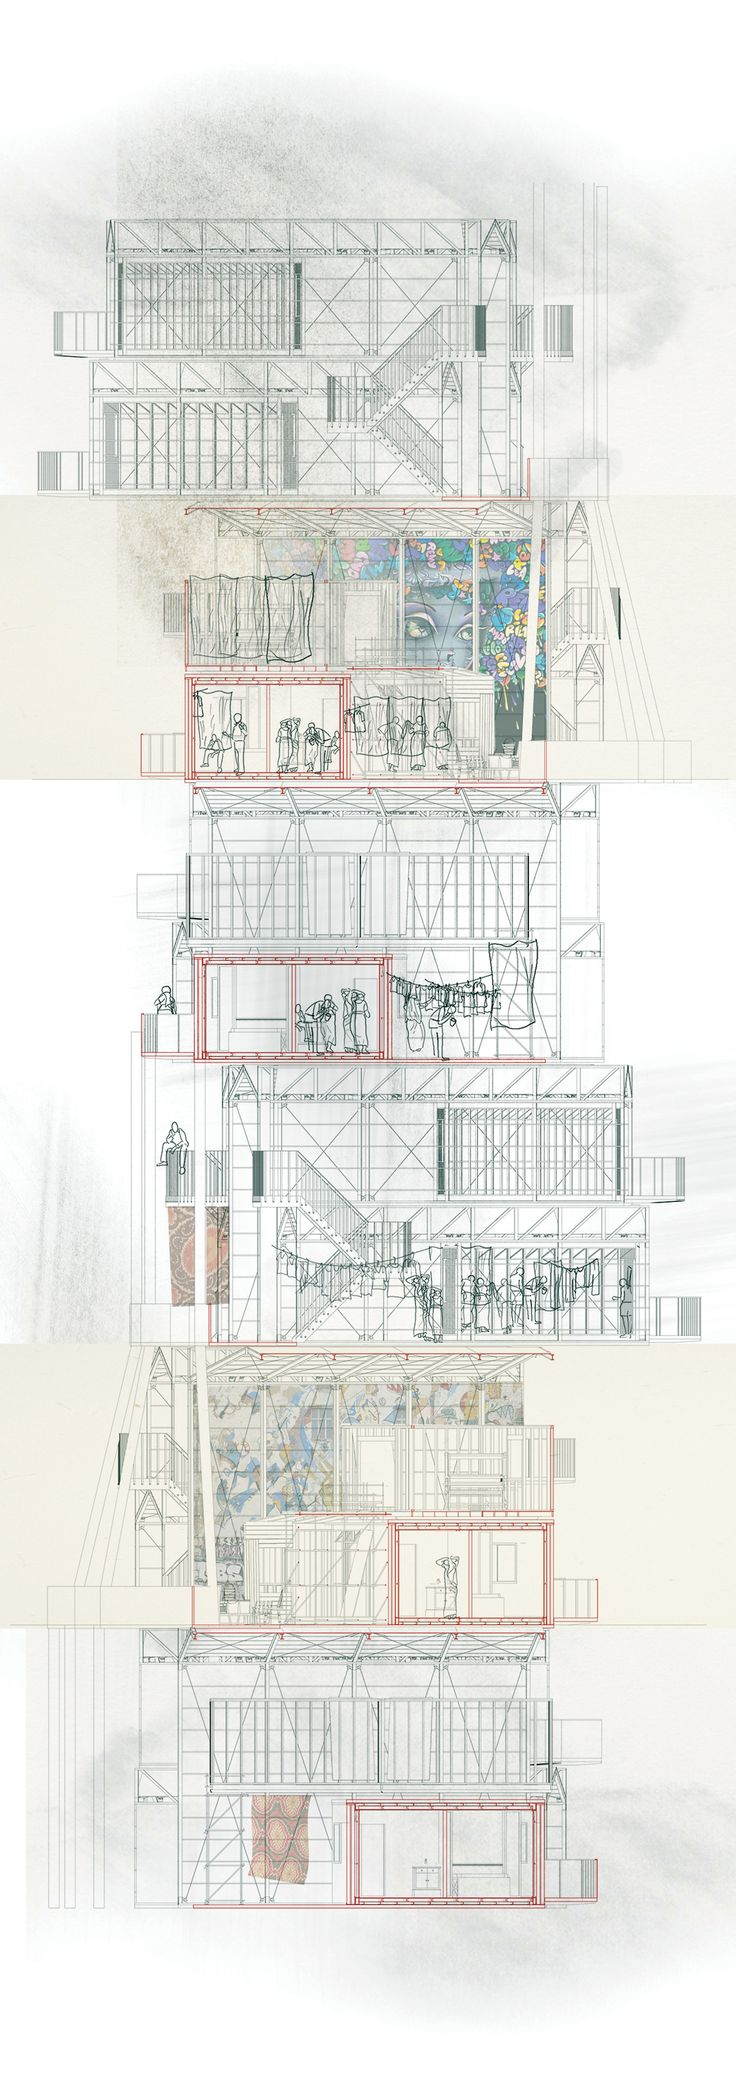 Kevin Woodward, Slum City/Immigration Centre, MArch Architecture, UWE Bristol, http://courses.uwe.ac.uk/K10B1